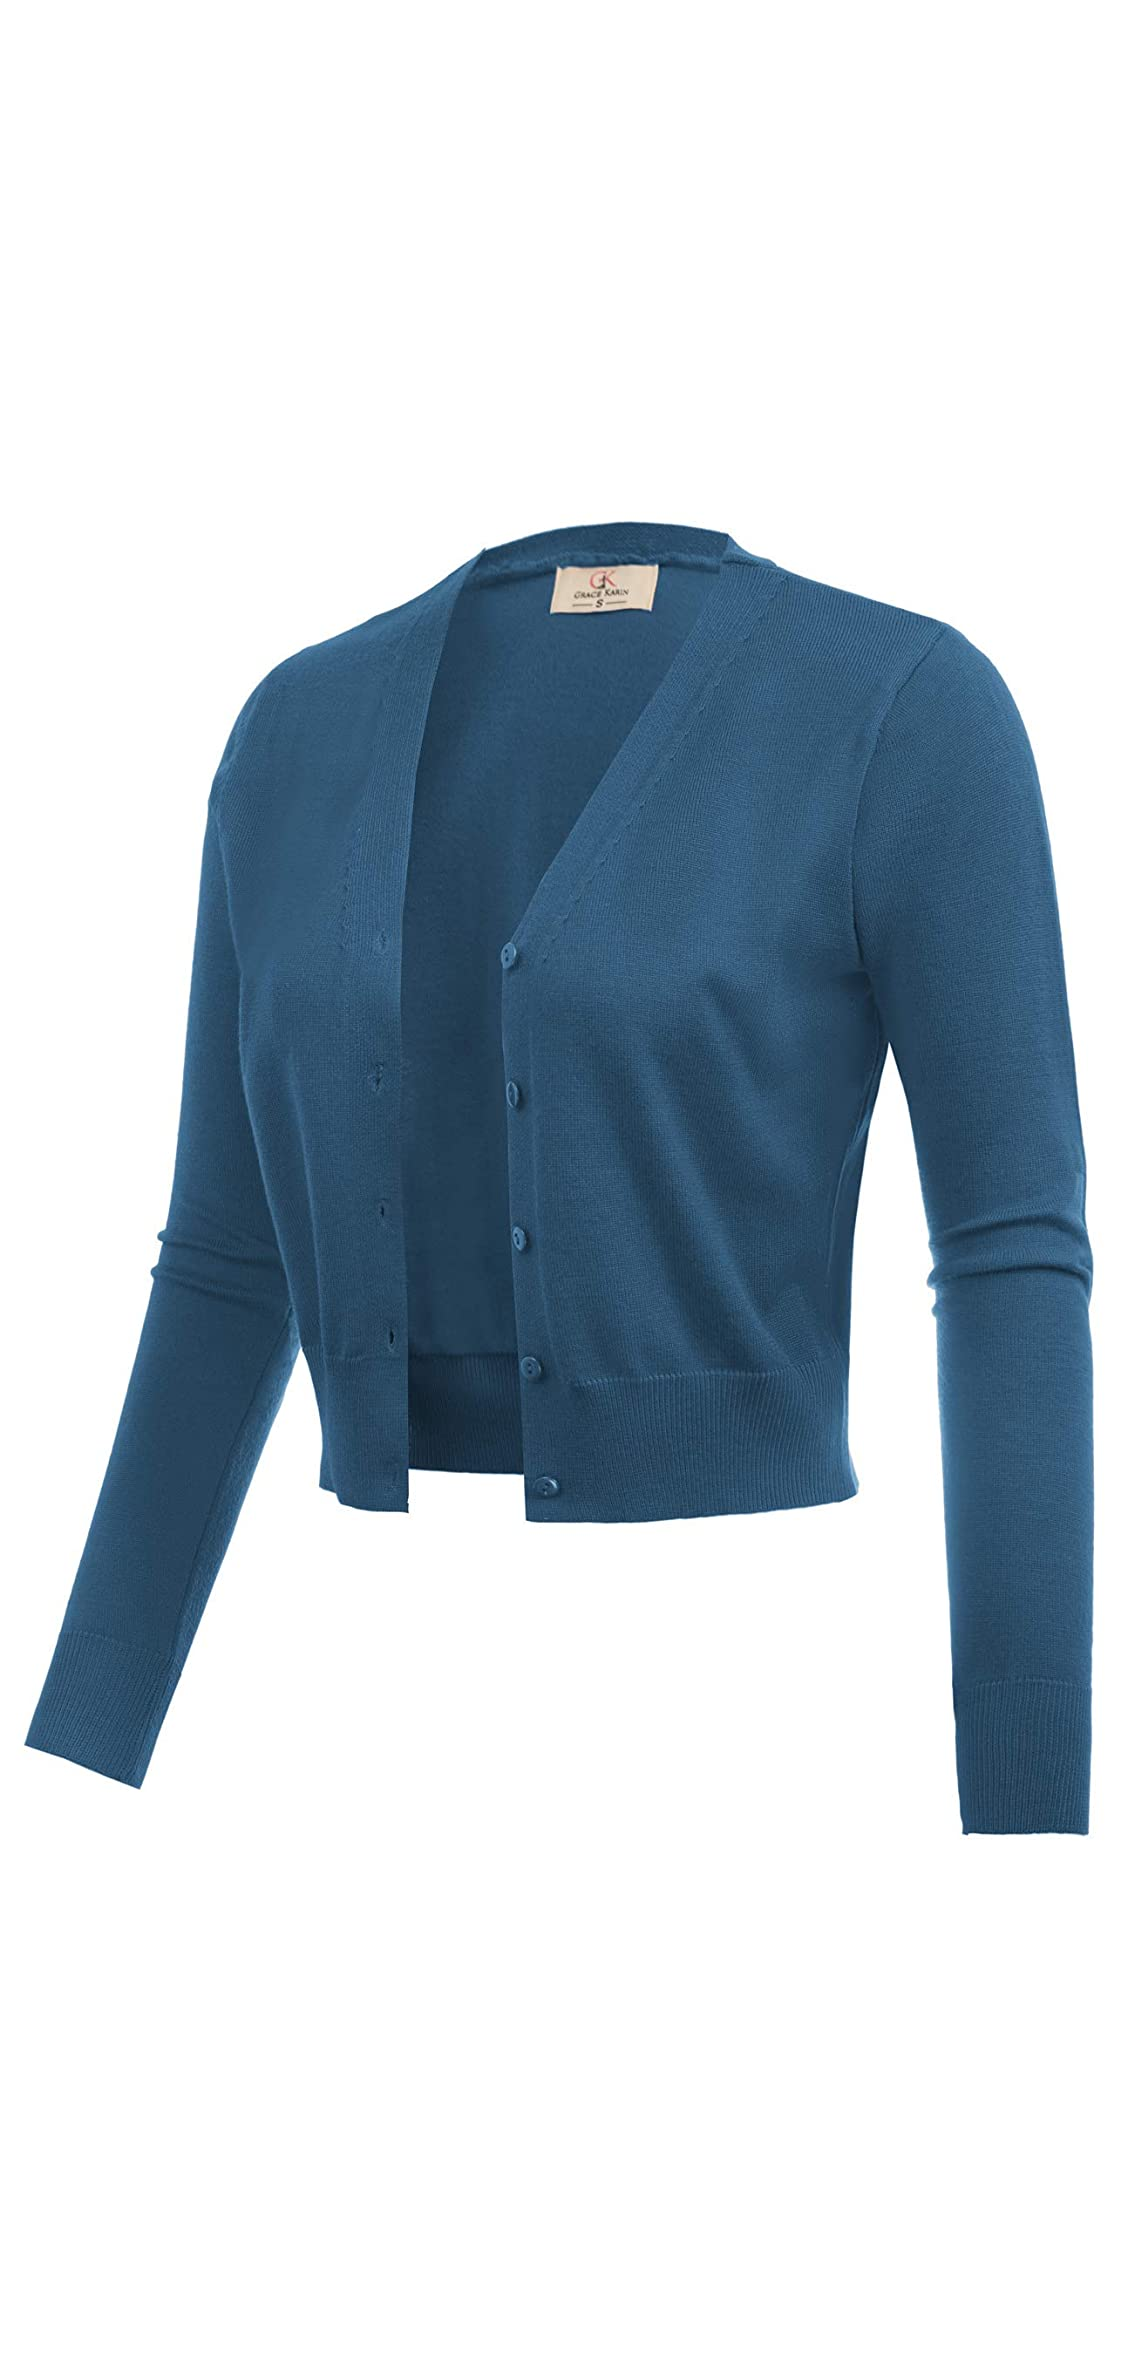 Women's Open Front Knit Cropped Bolero Shrug Sweater